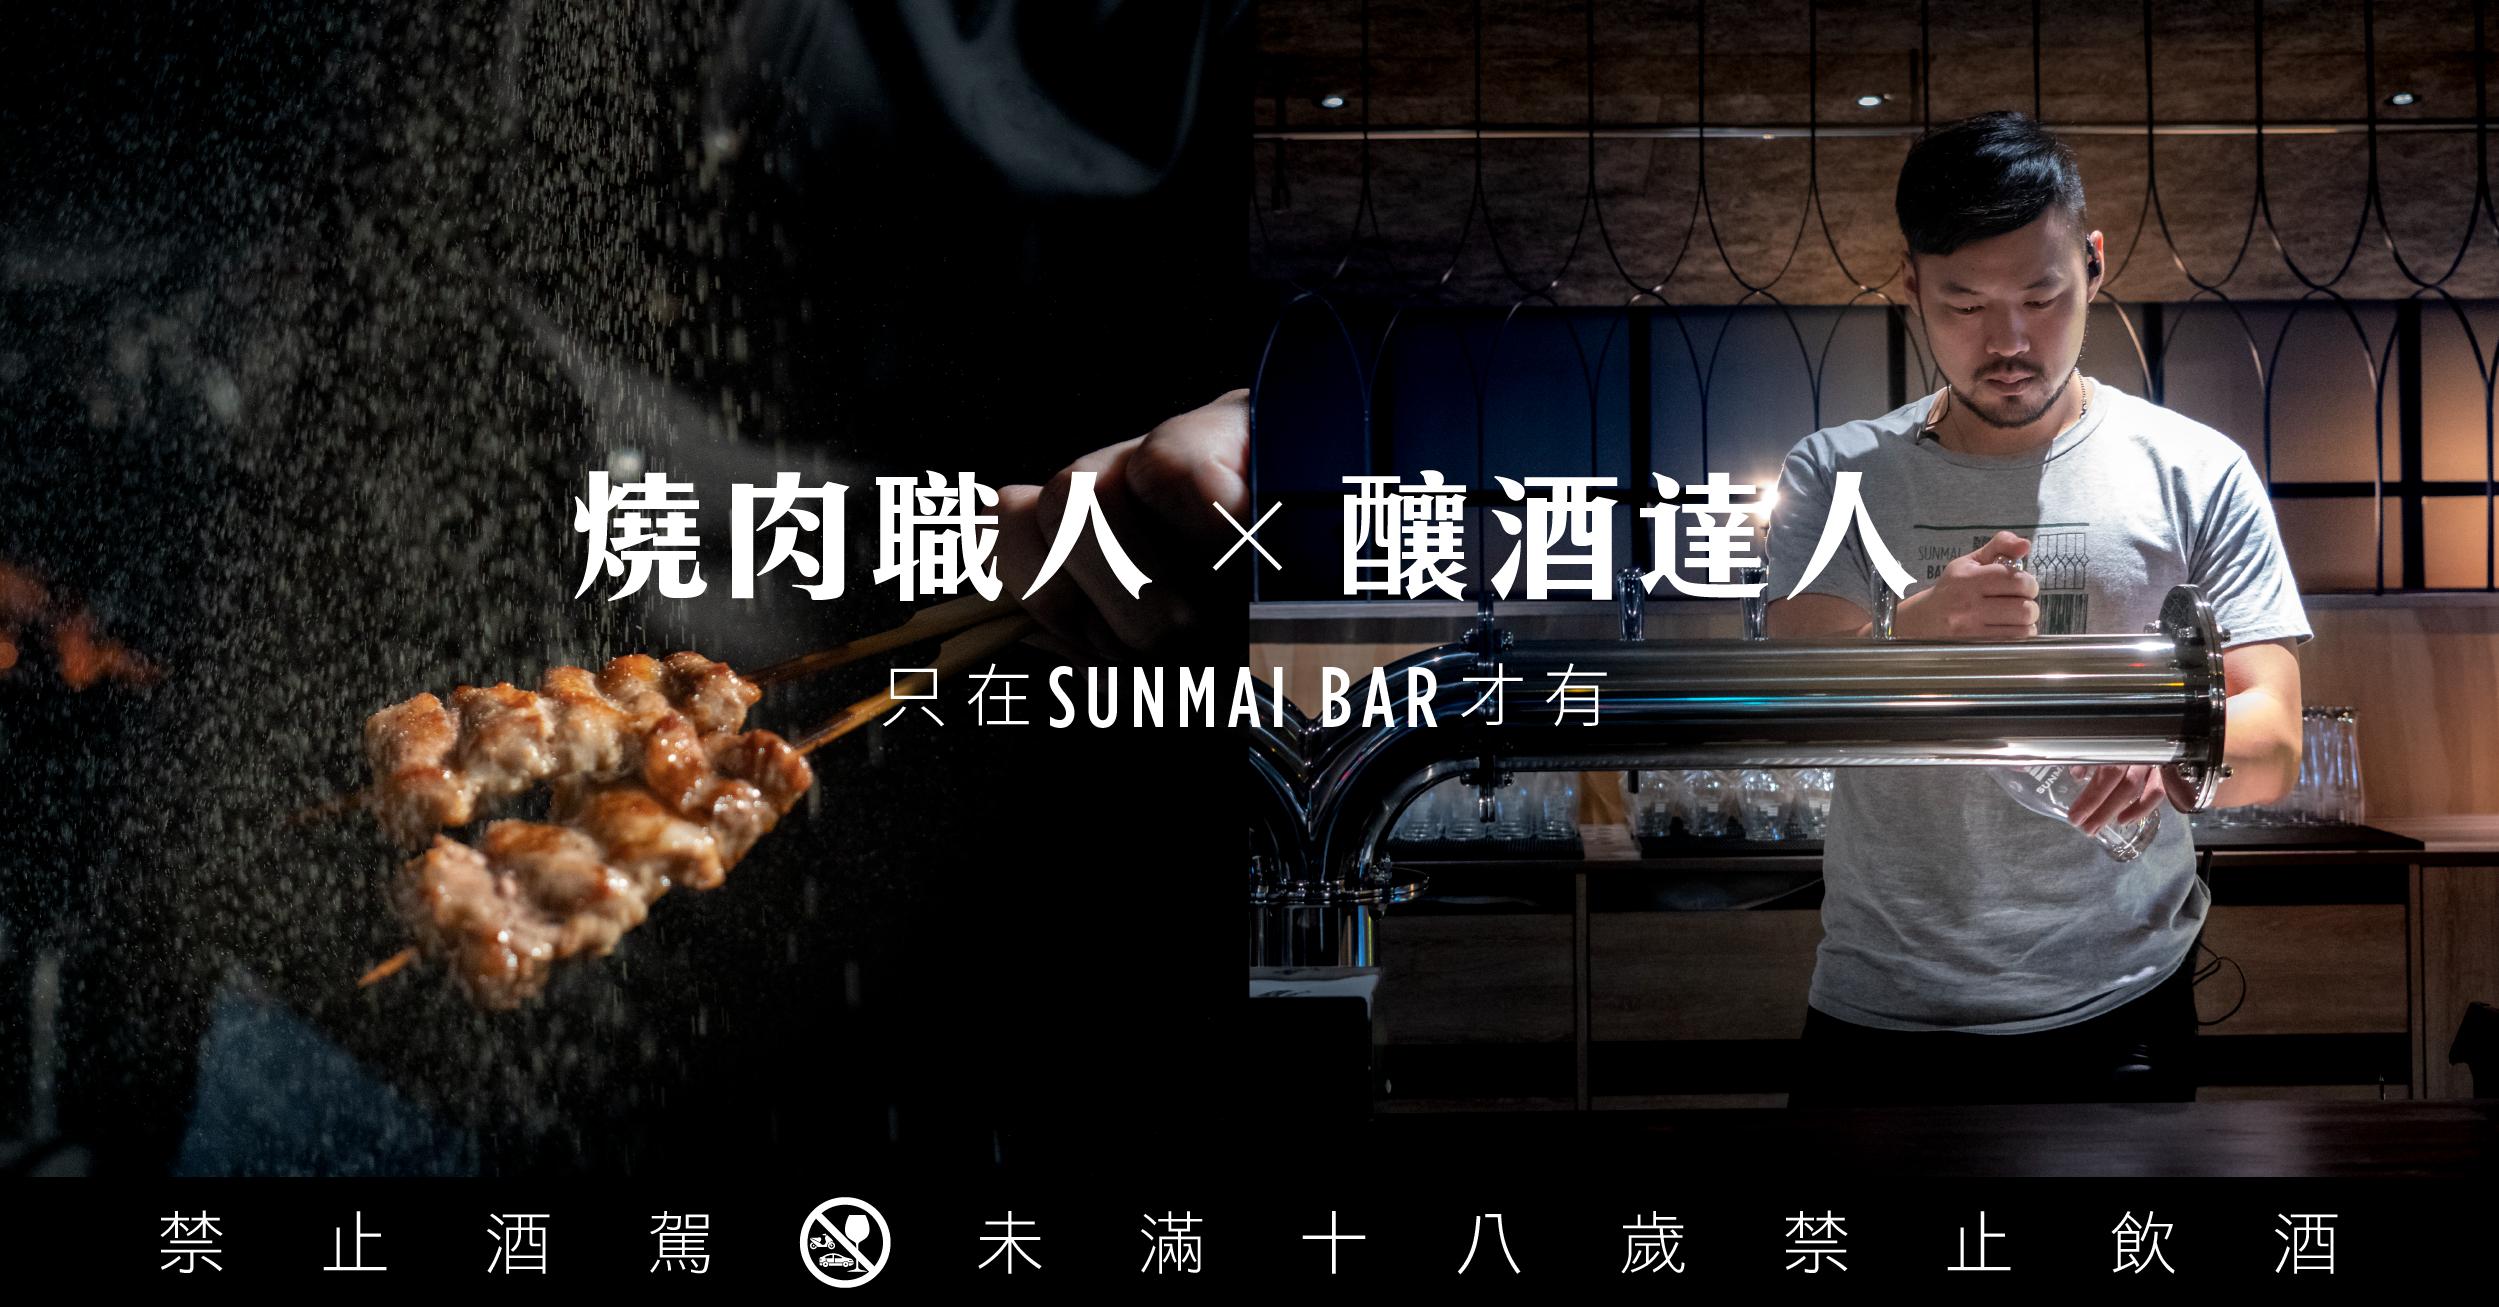 2019-SUNMAI-BAR-胡同『釀酒達人X燒肉職人』